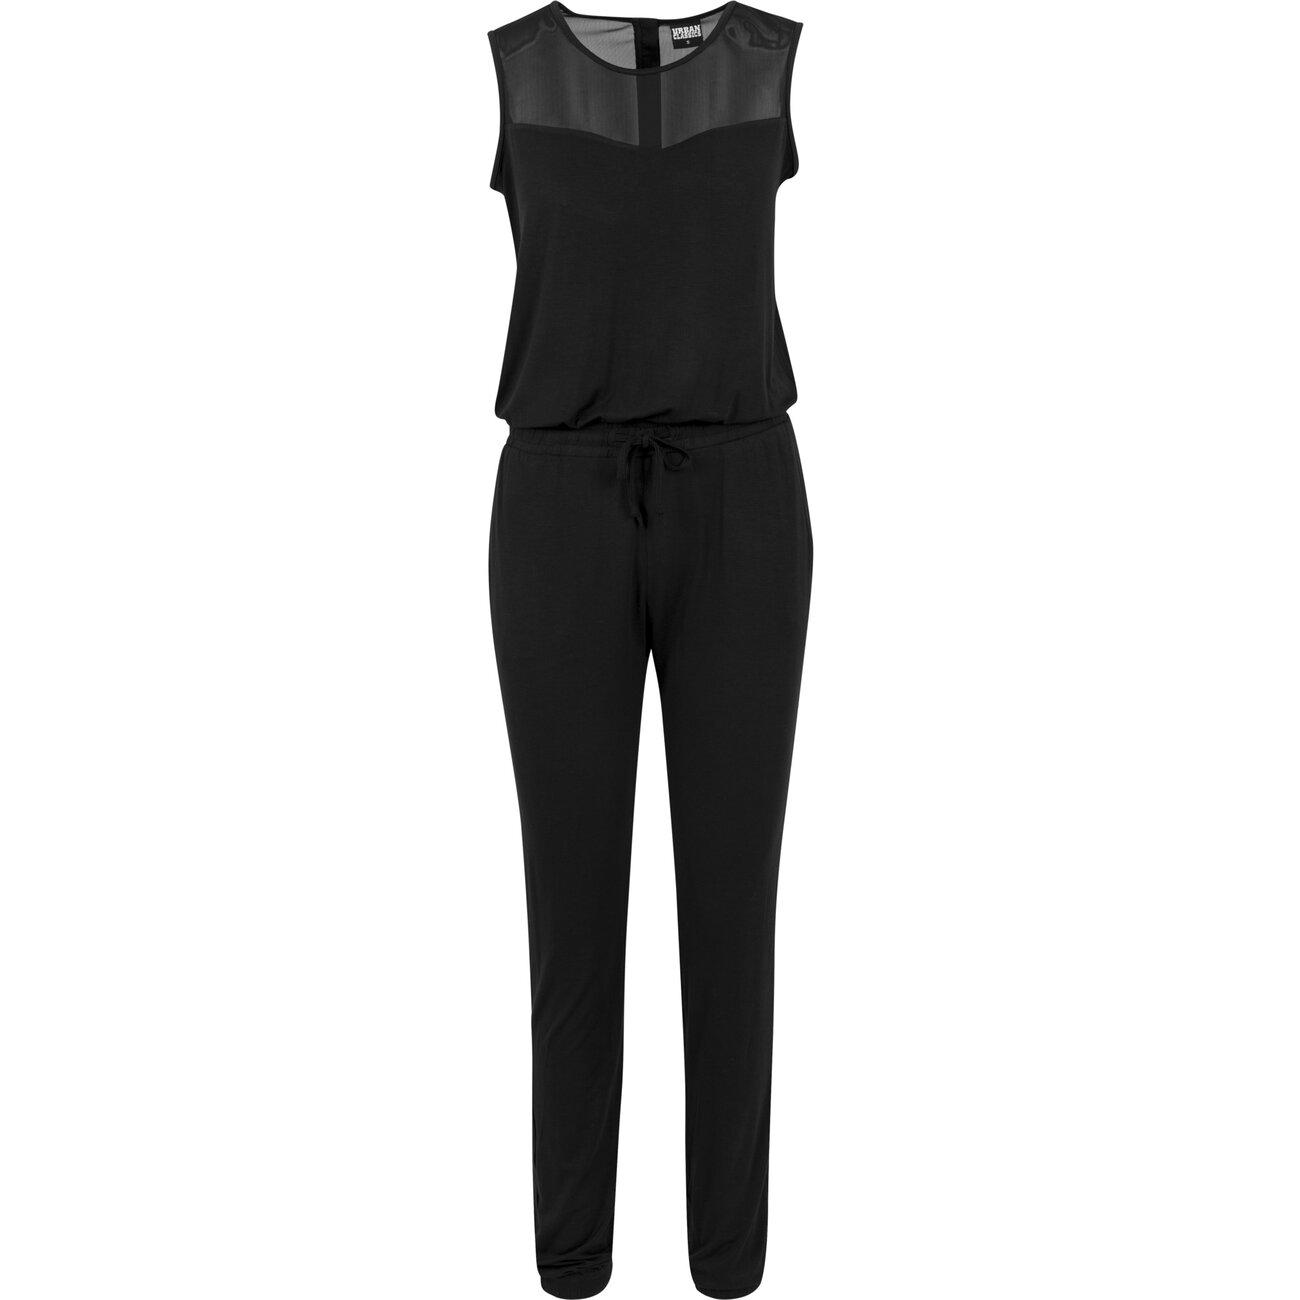 urban classics jumpsuit damen melange look einteiler anzug. Black Bedroom Furniture Sets. Home Design Ideas